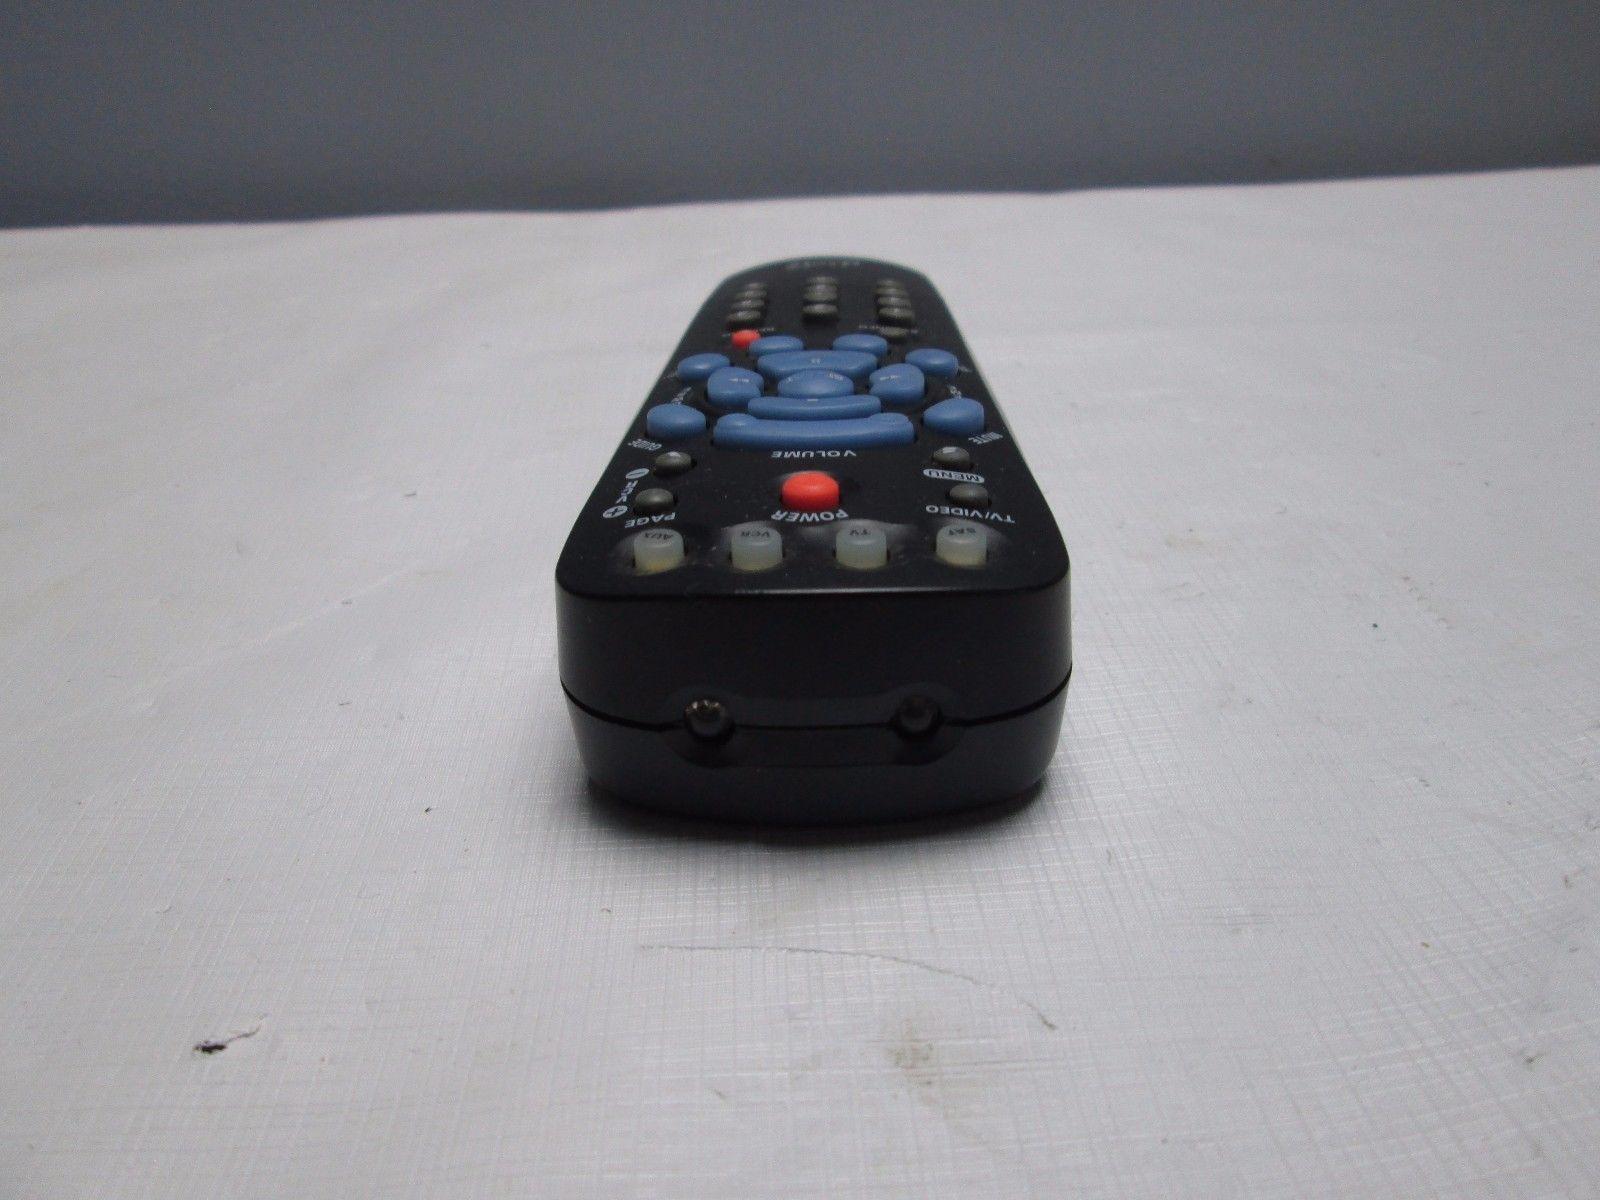 Dish Network Remote Control  Bell ExpressVU 1.5 IR  301 Control 113268 image 5